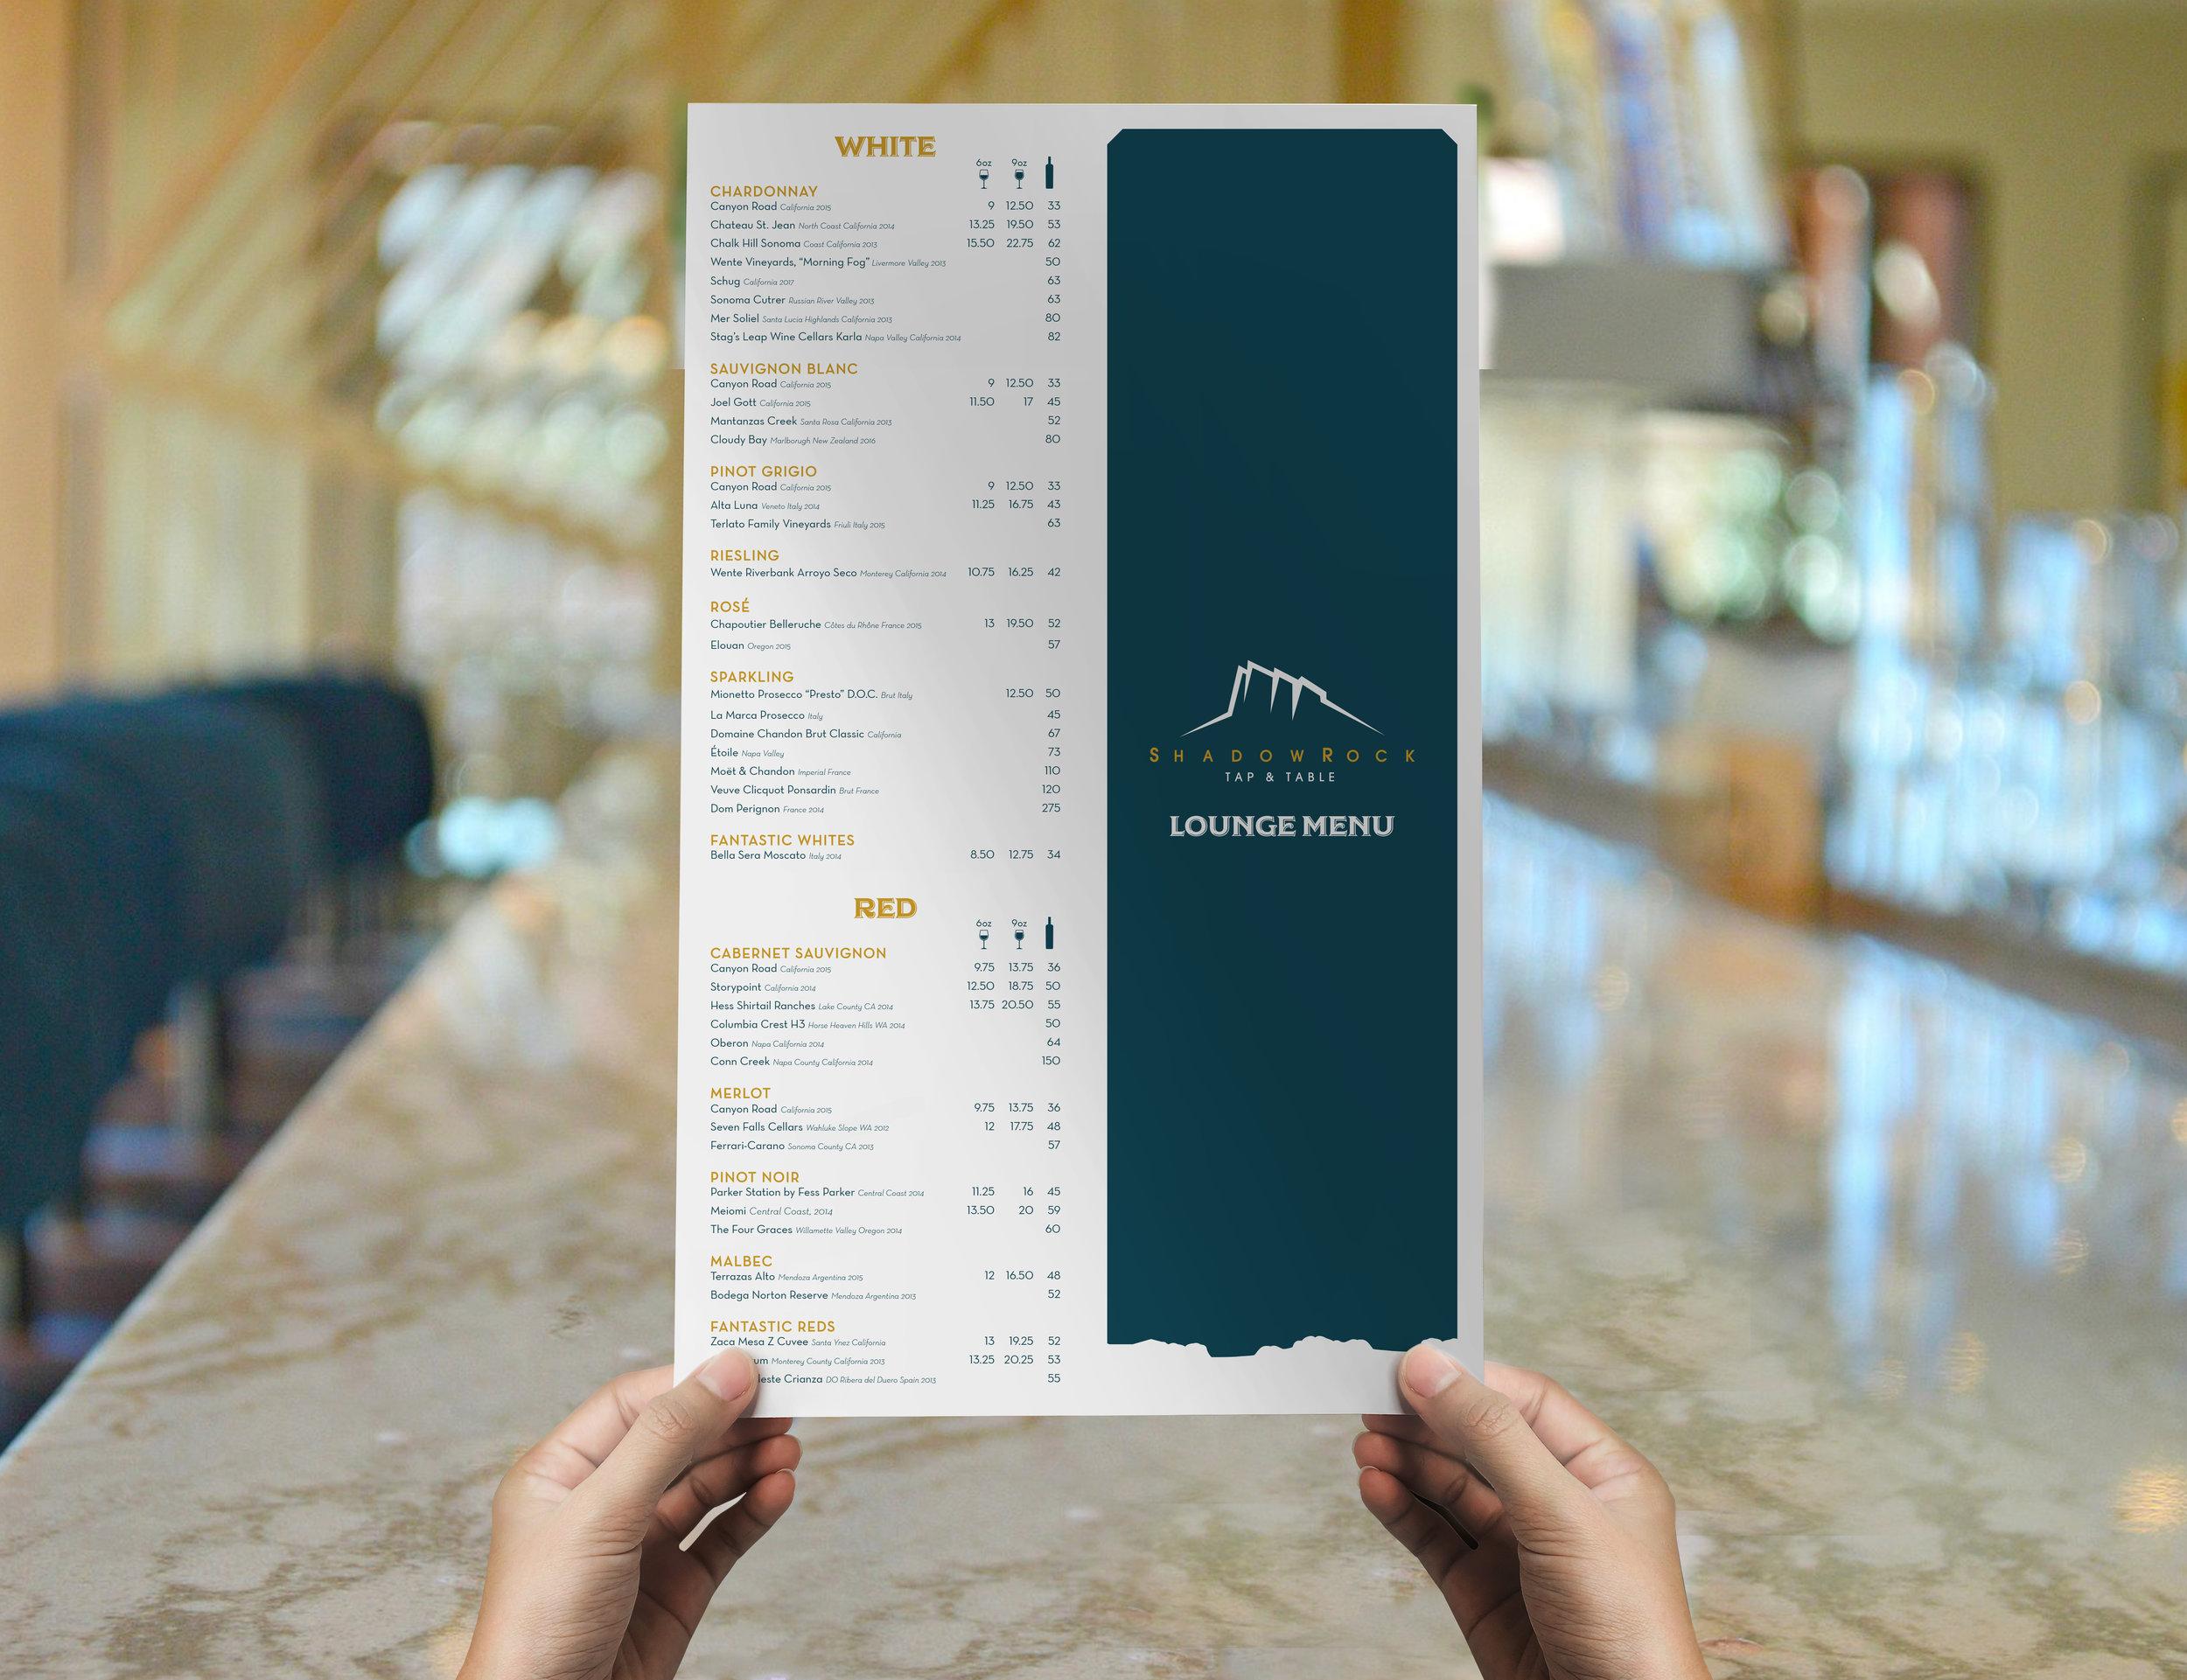 Hilton Sedona Shadowrock Tap & Table Branding Lounge Menu